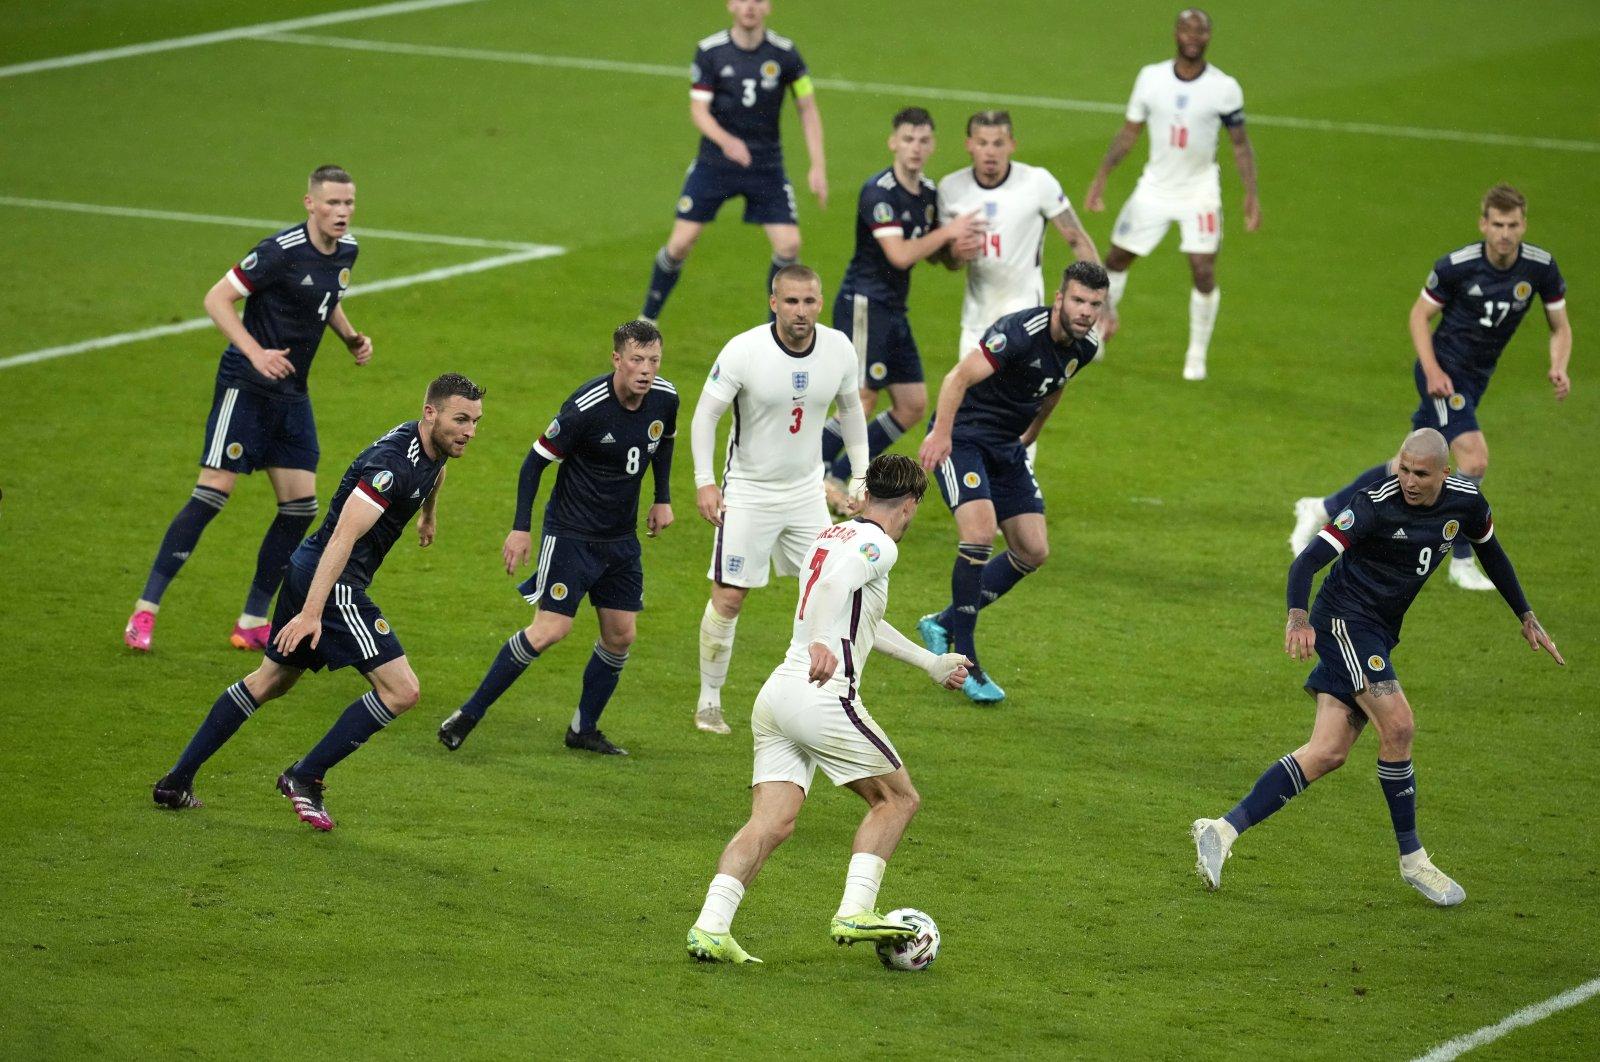 England, Scotland draw 0-0 at EURO 2020